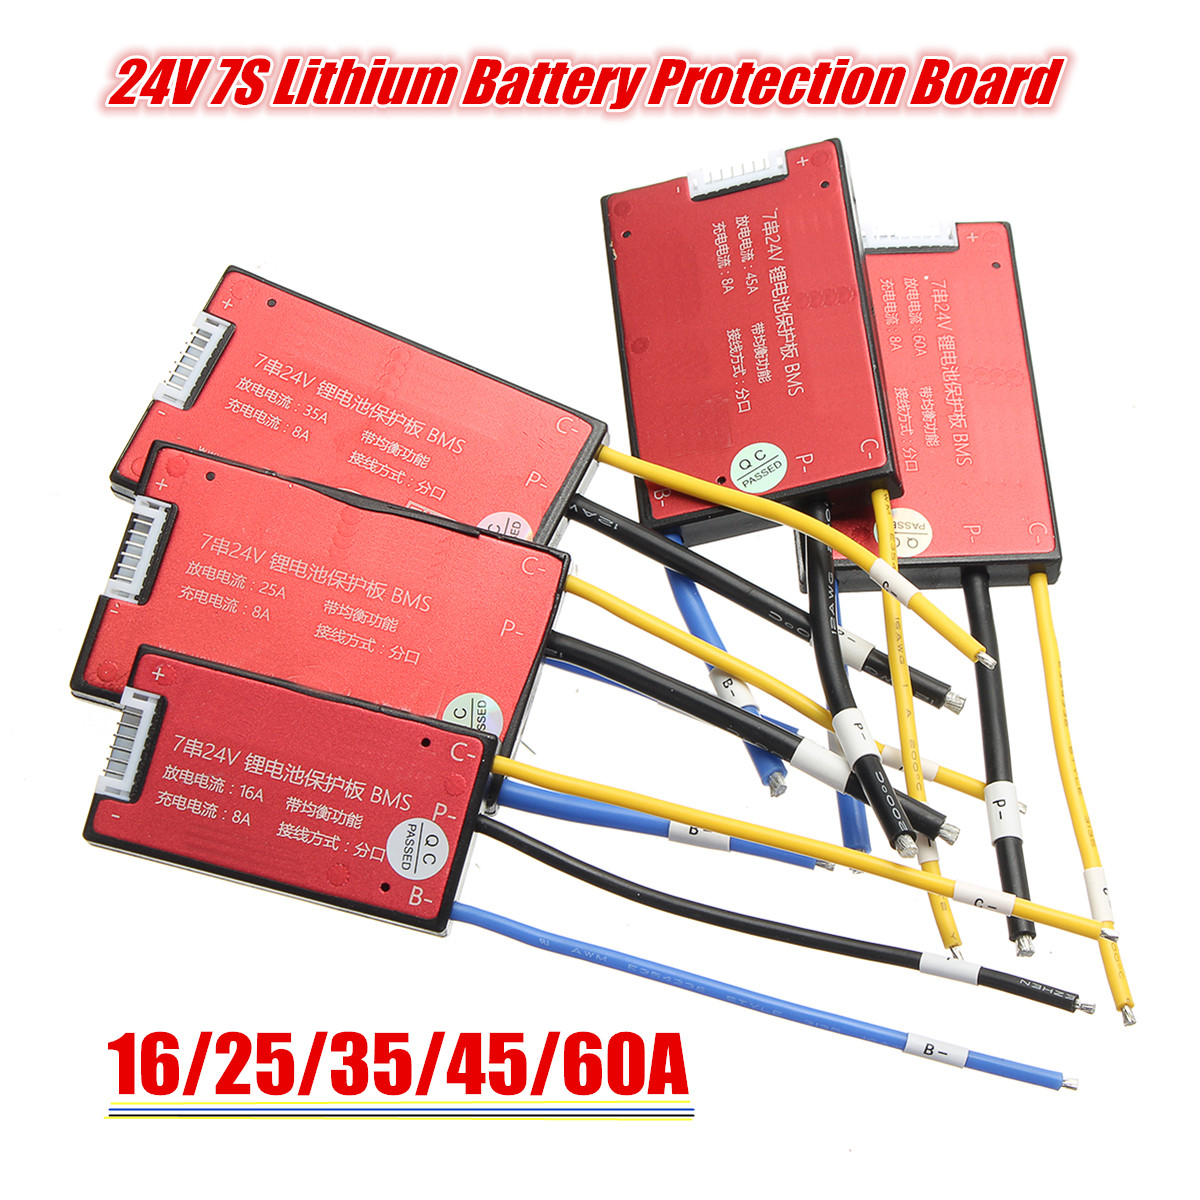 13s 48v 16a 18a 25a 35a 45a 60a Lithium Battery Protection Board Bms 4v Pcb Circuit Croons 74v 18650 16v 7s Li Ion Lipolymer